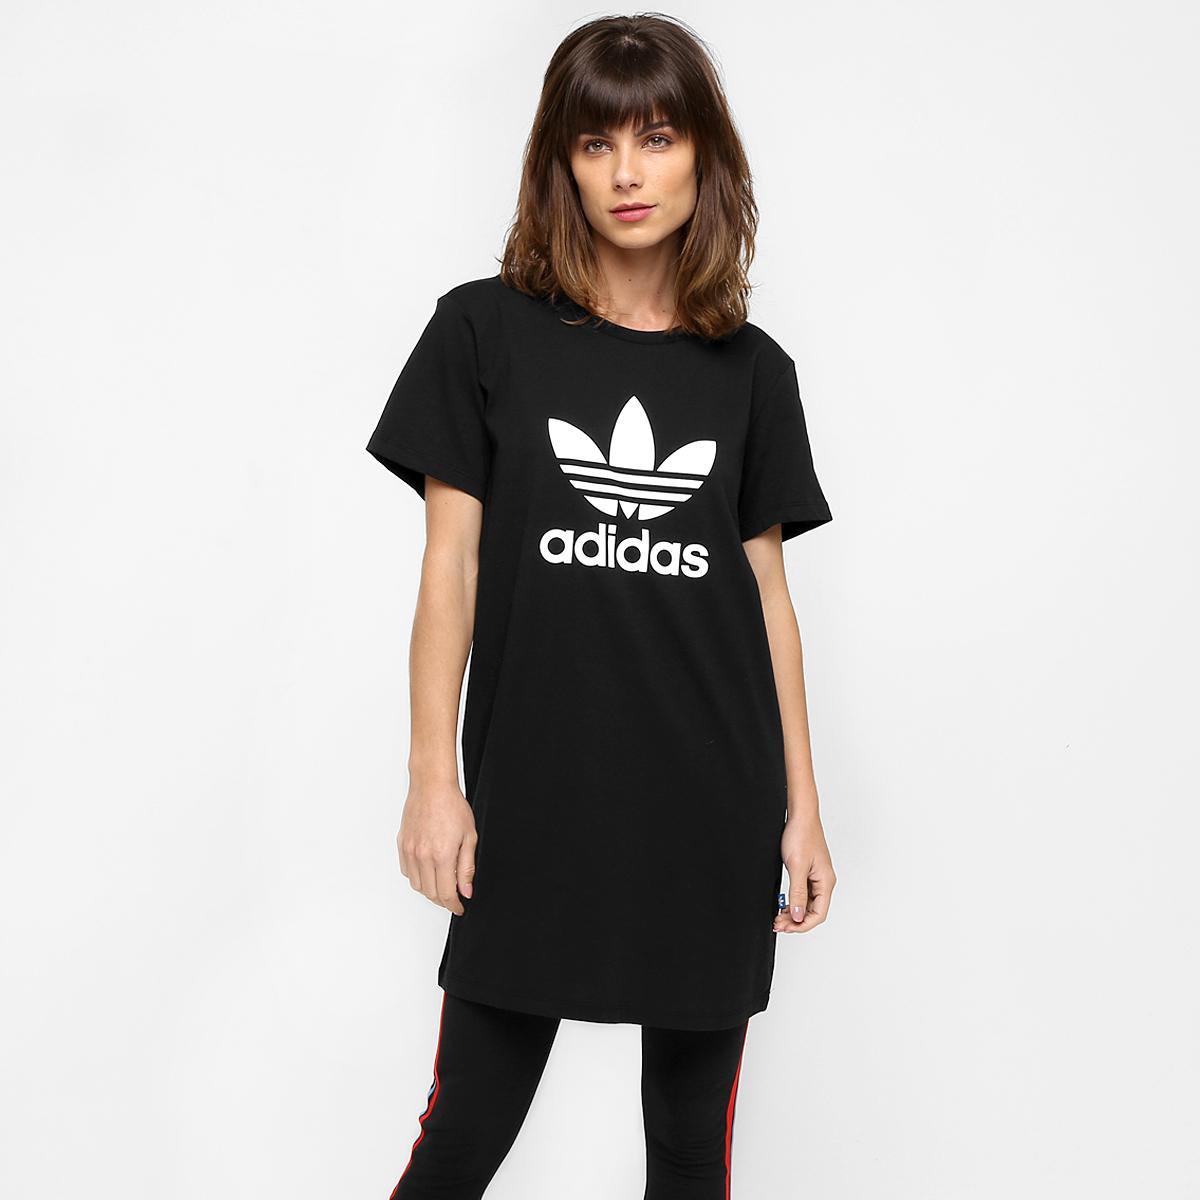 Vestido Camiseta Adidas Curto Originals Trefoiltee Preto